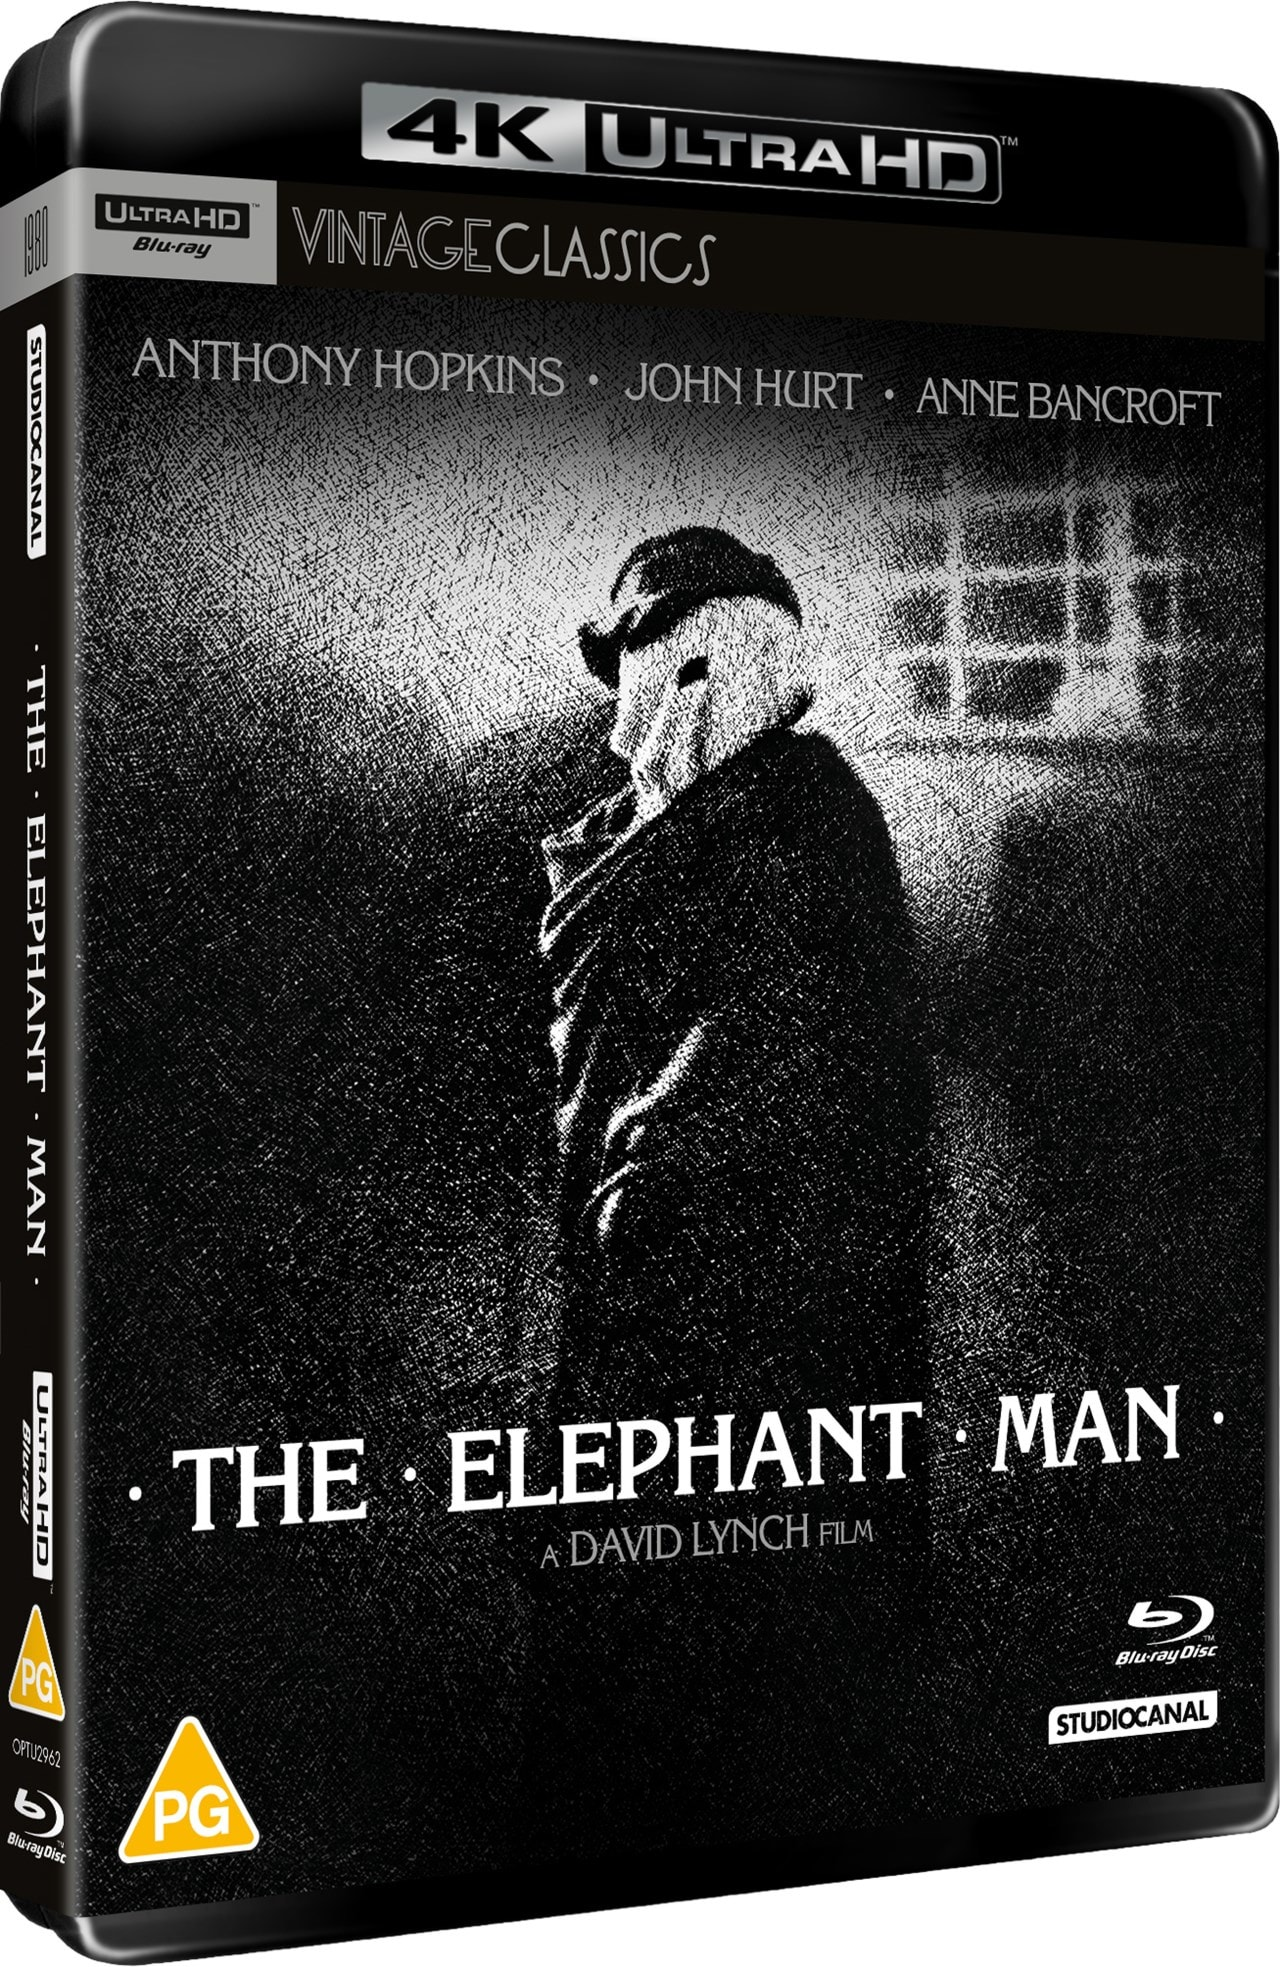 The Elephant Man - 4